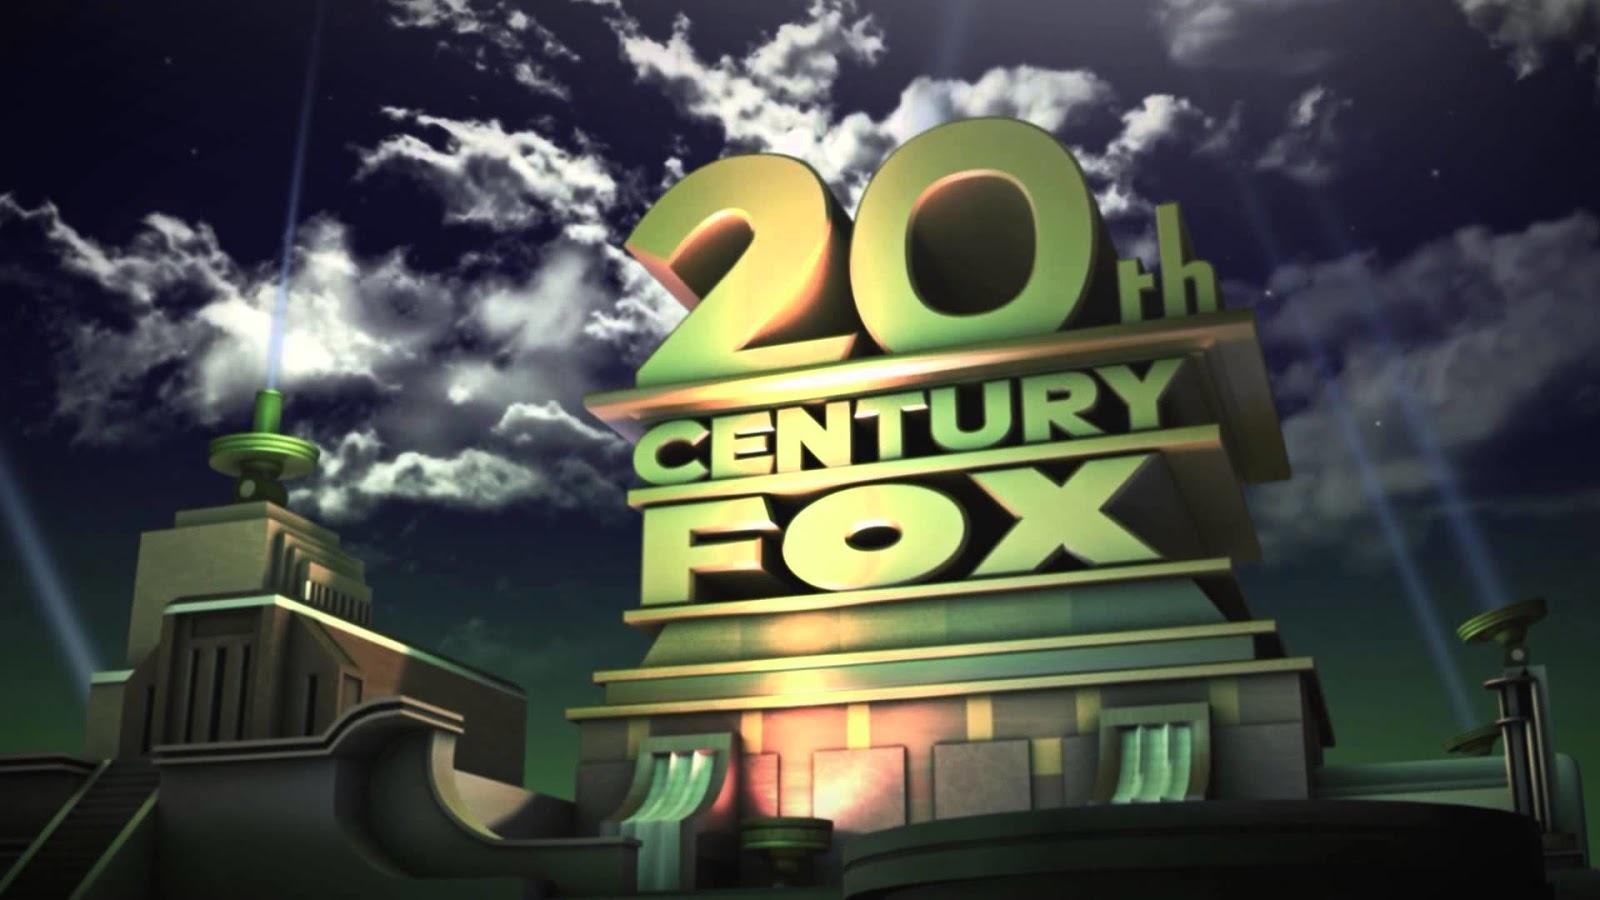 Fox Logo Wallpapers brands wallpapers hd